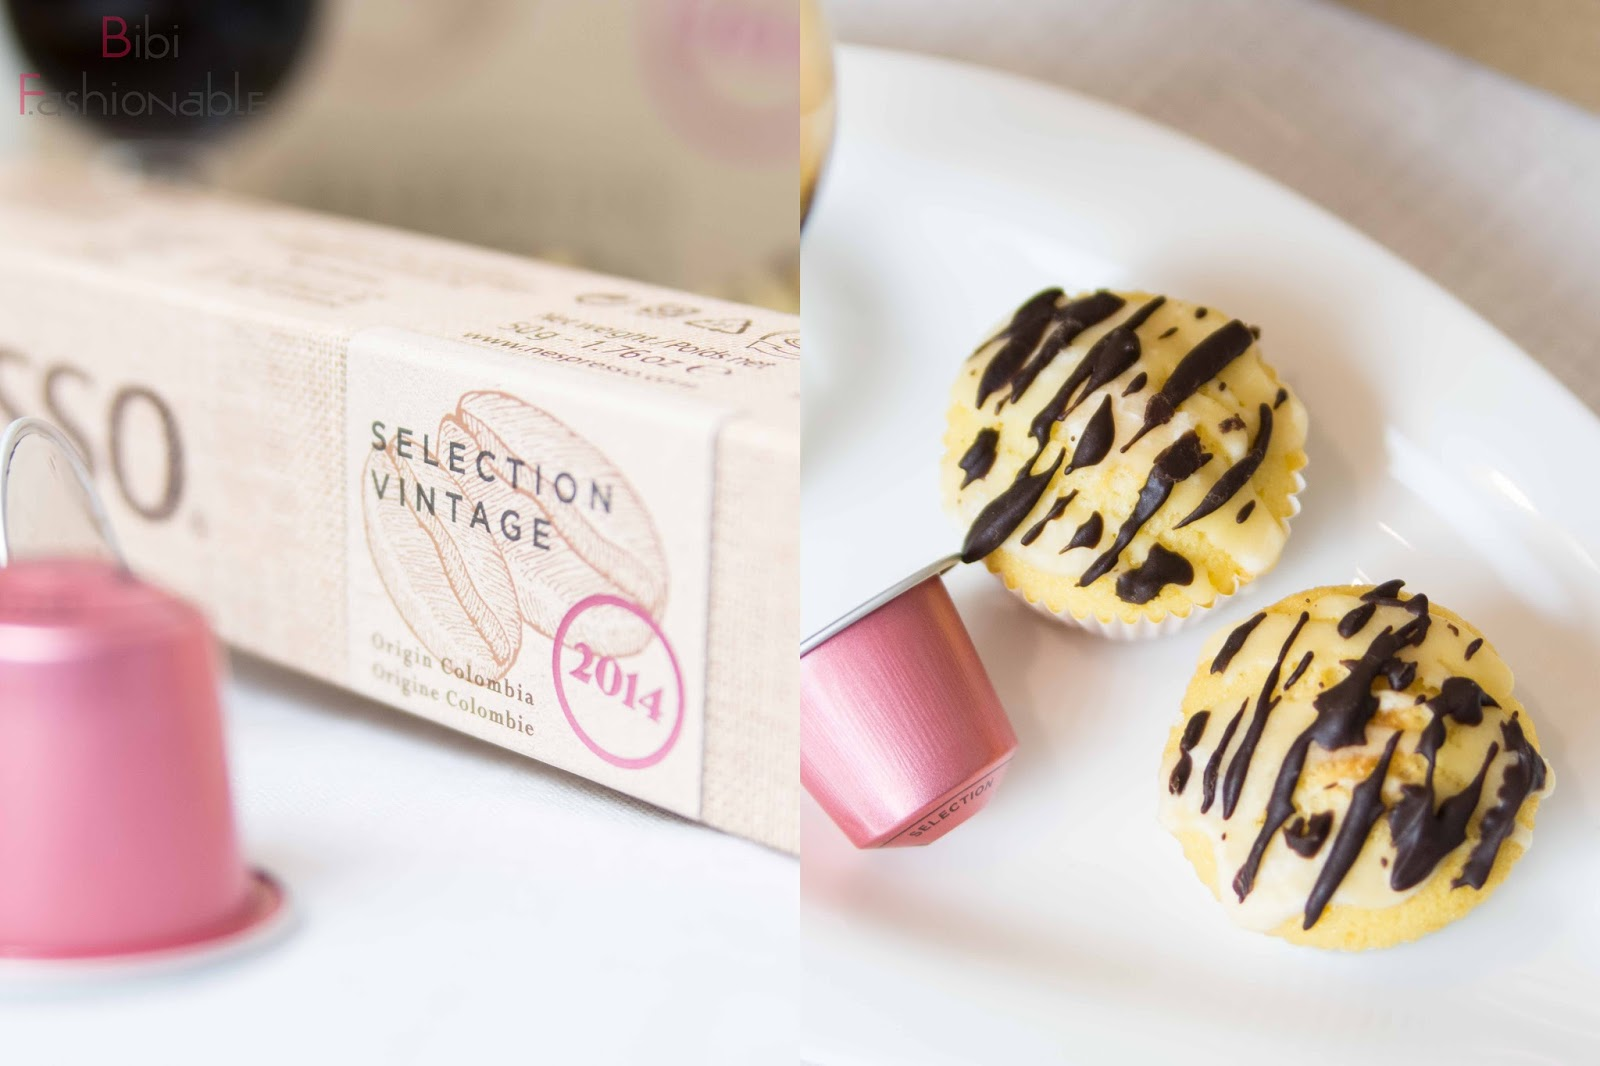 Selektion Vintage 2014 Verpackung mini Eierlikör Muffins oben